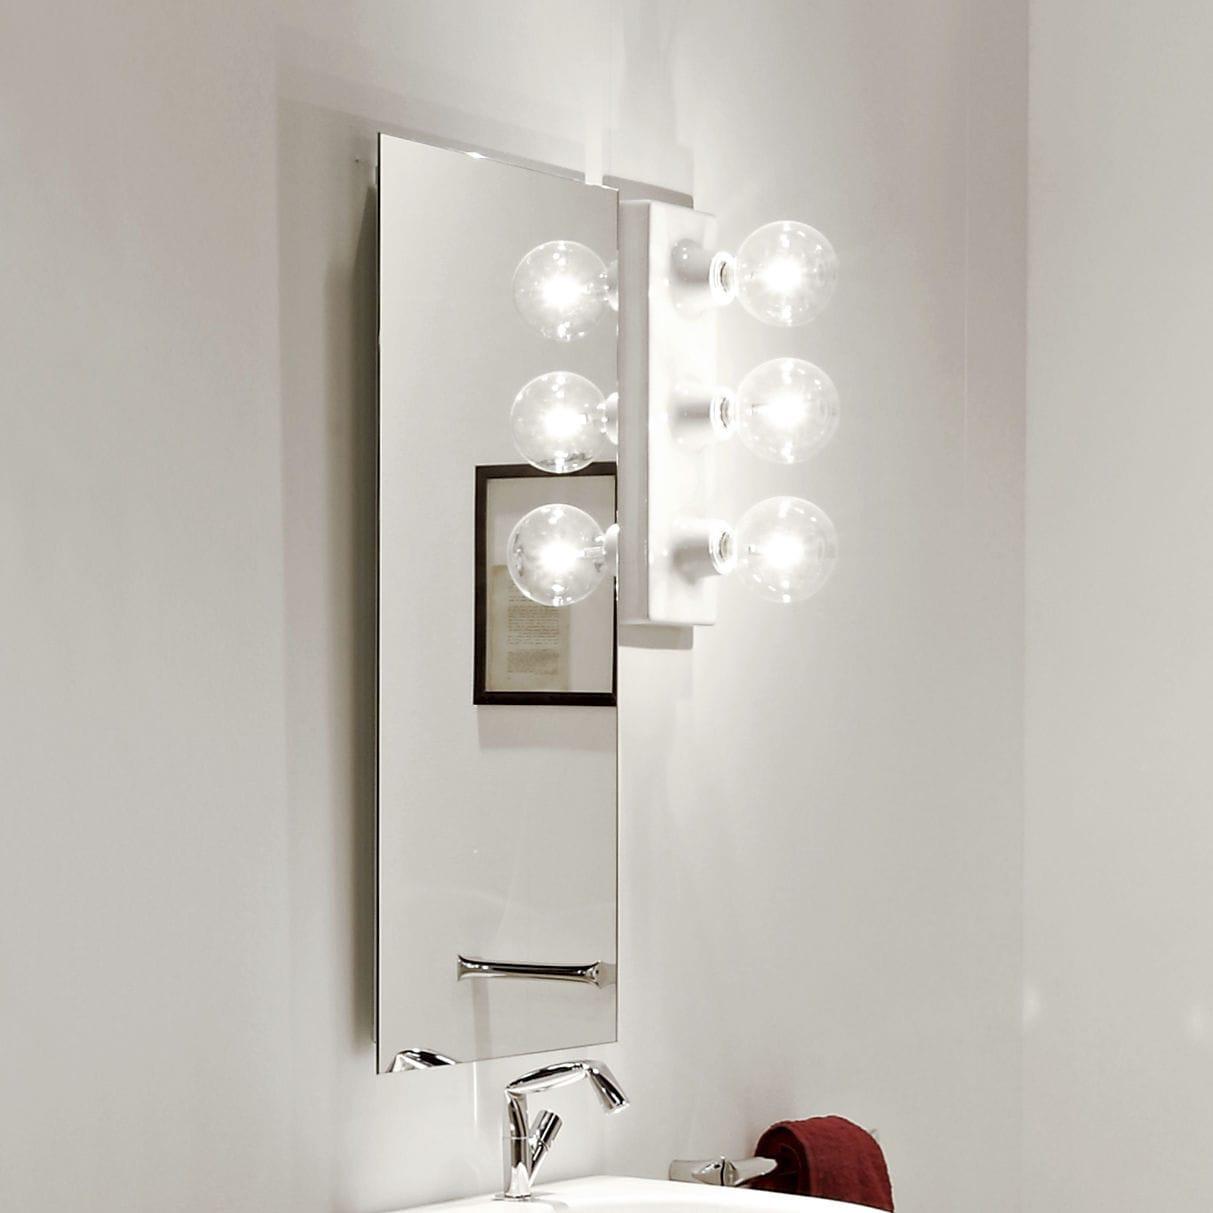 Salle De Bain Sol Effet Parquet ~ Miroir De Salle De Bain Mural Lumineux Contemporain